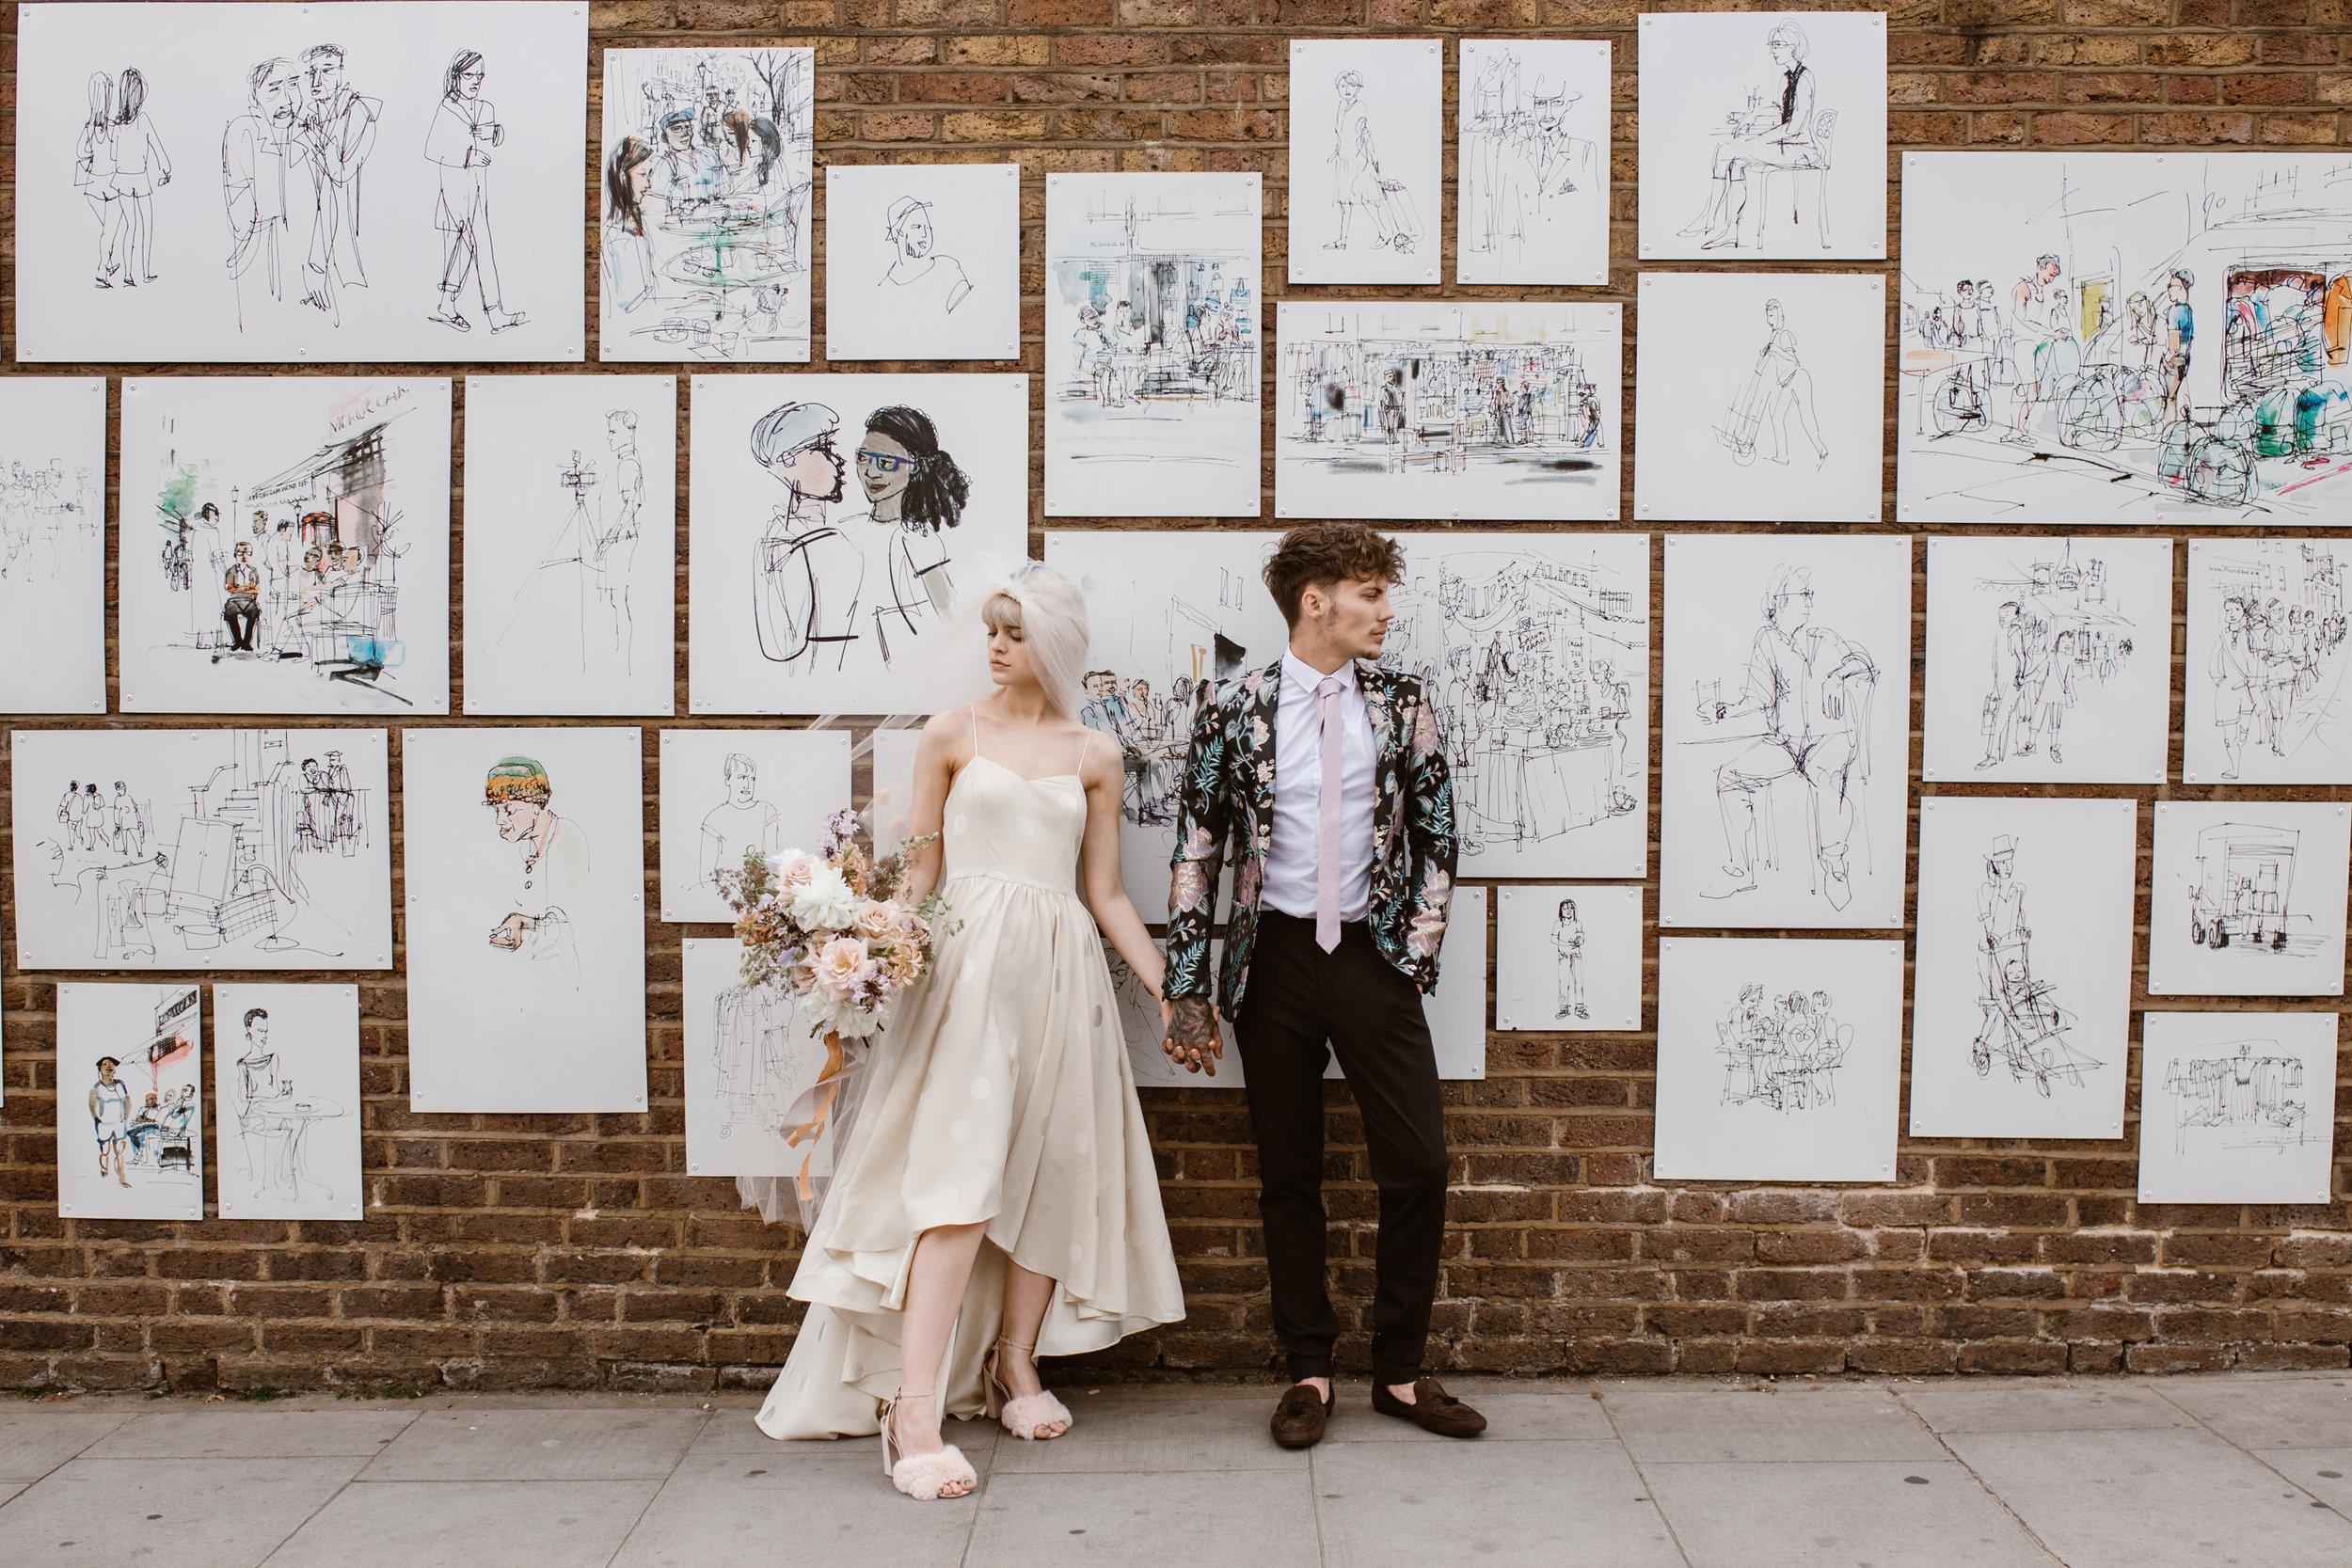 London Elopement - The Un-Wedding